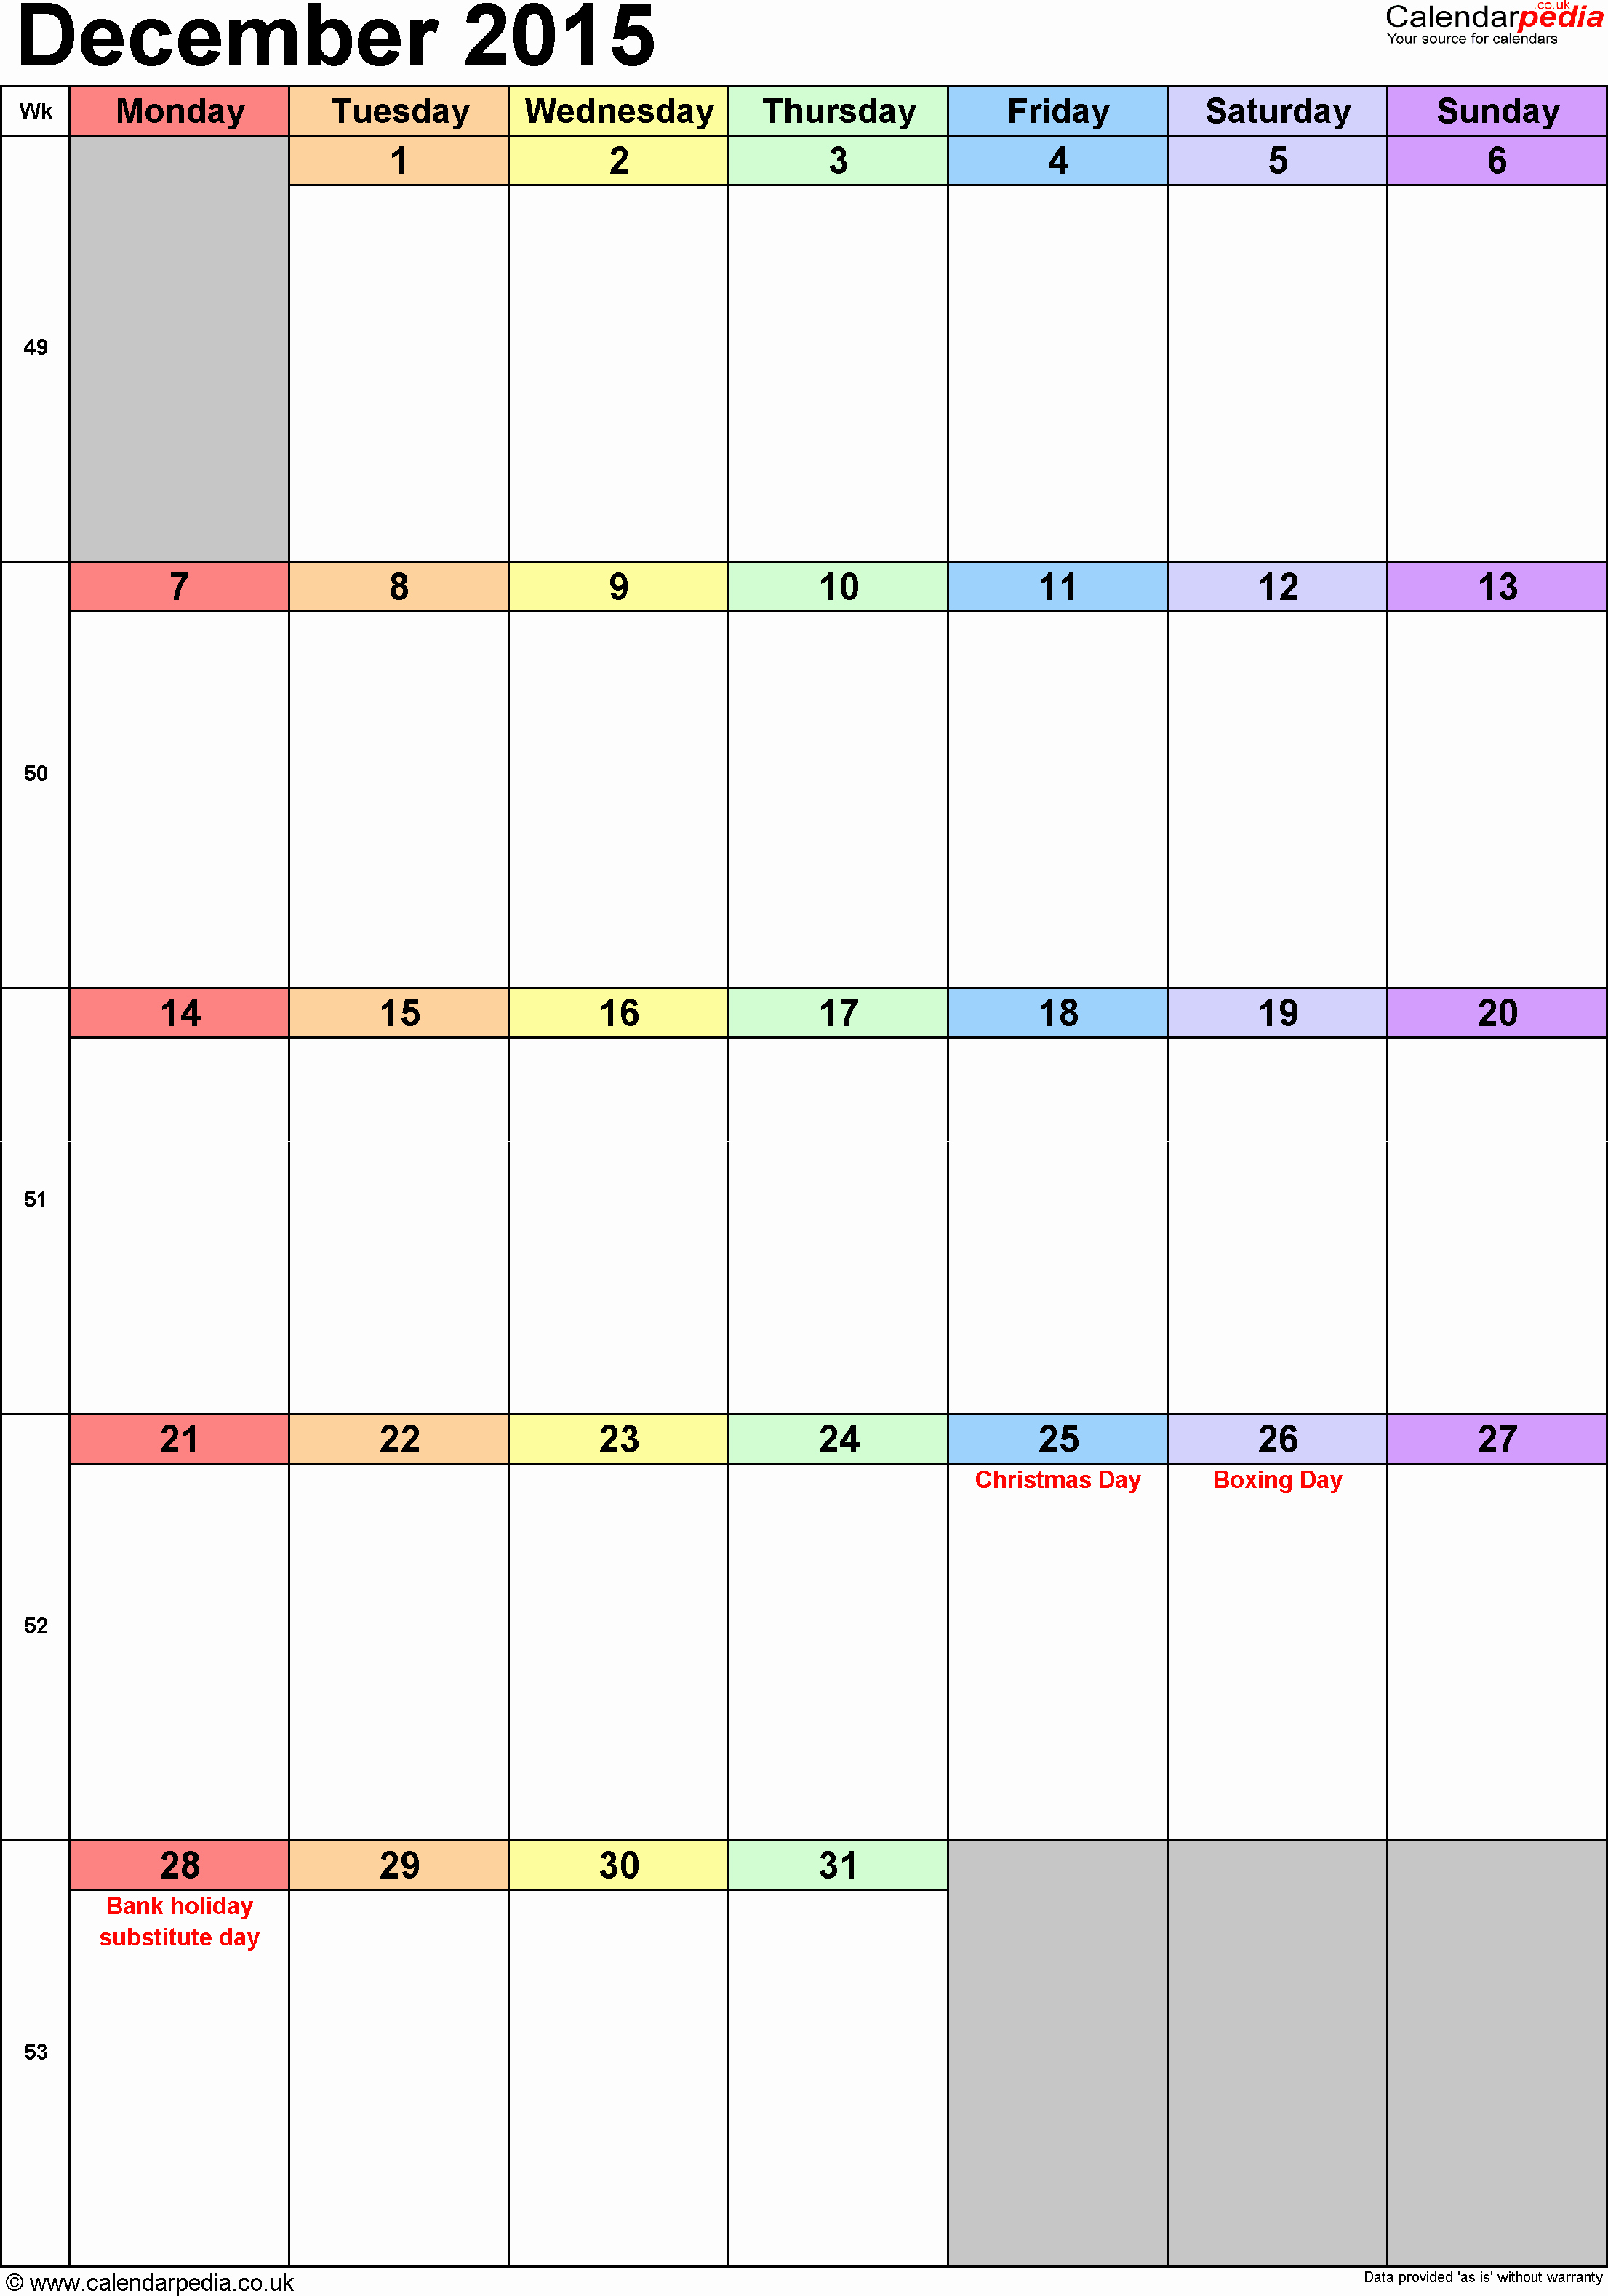 December 2015 Calendar Word Document Best Of Calendar December 2015 Uk Bank Holidays Excel Pdf Word